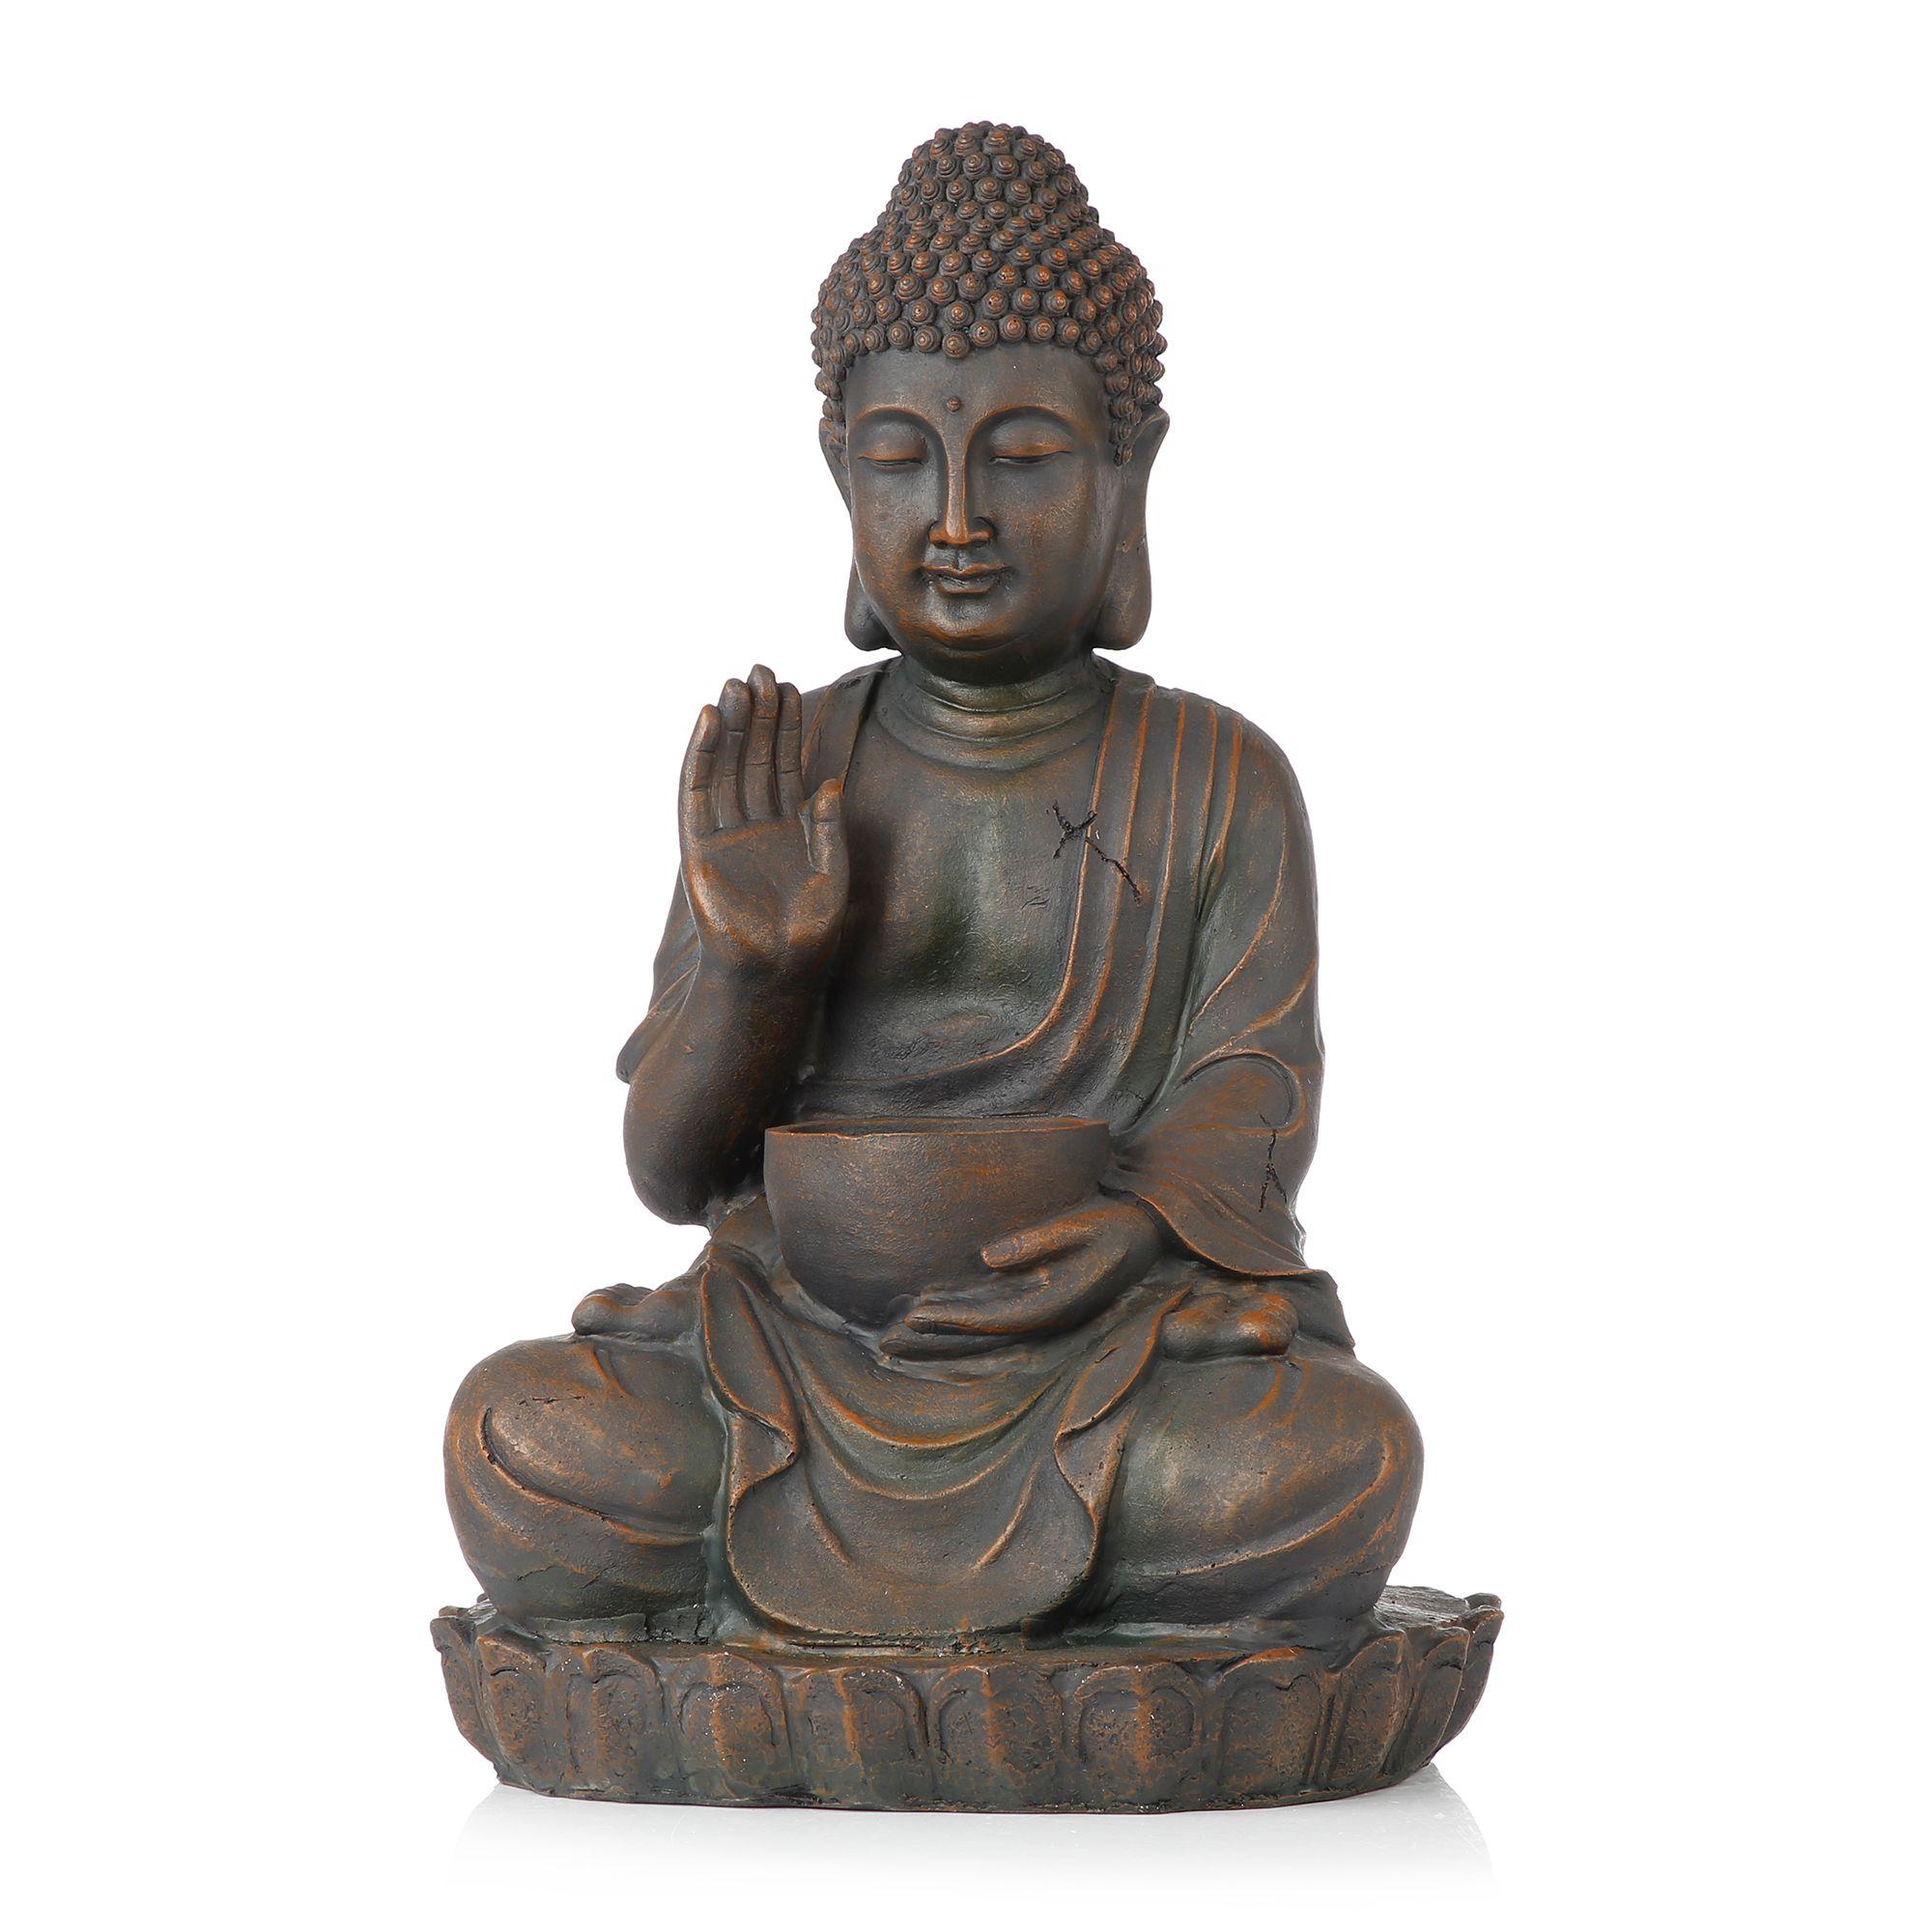 Gartendeko Buddha Brunnen Beleuchtet Polyresin Ca 51x33x25cm